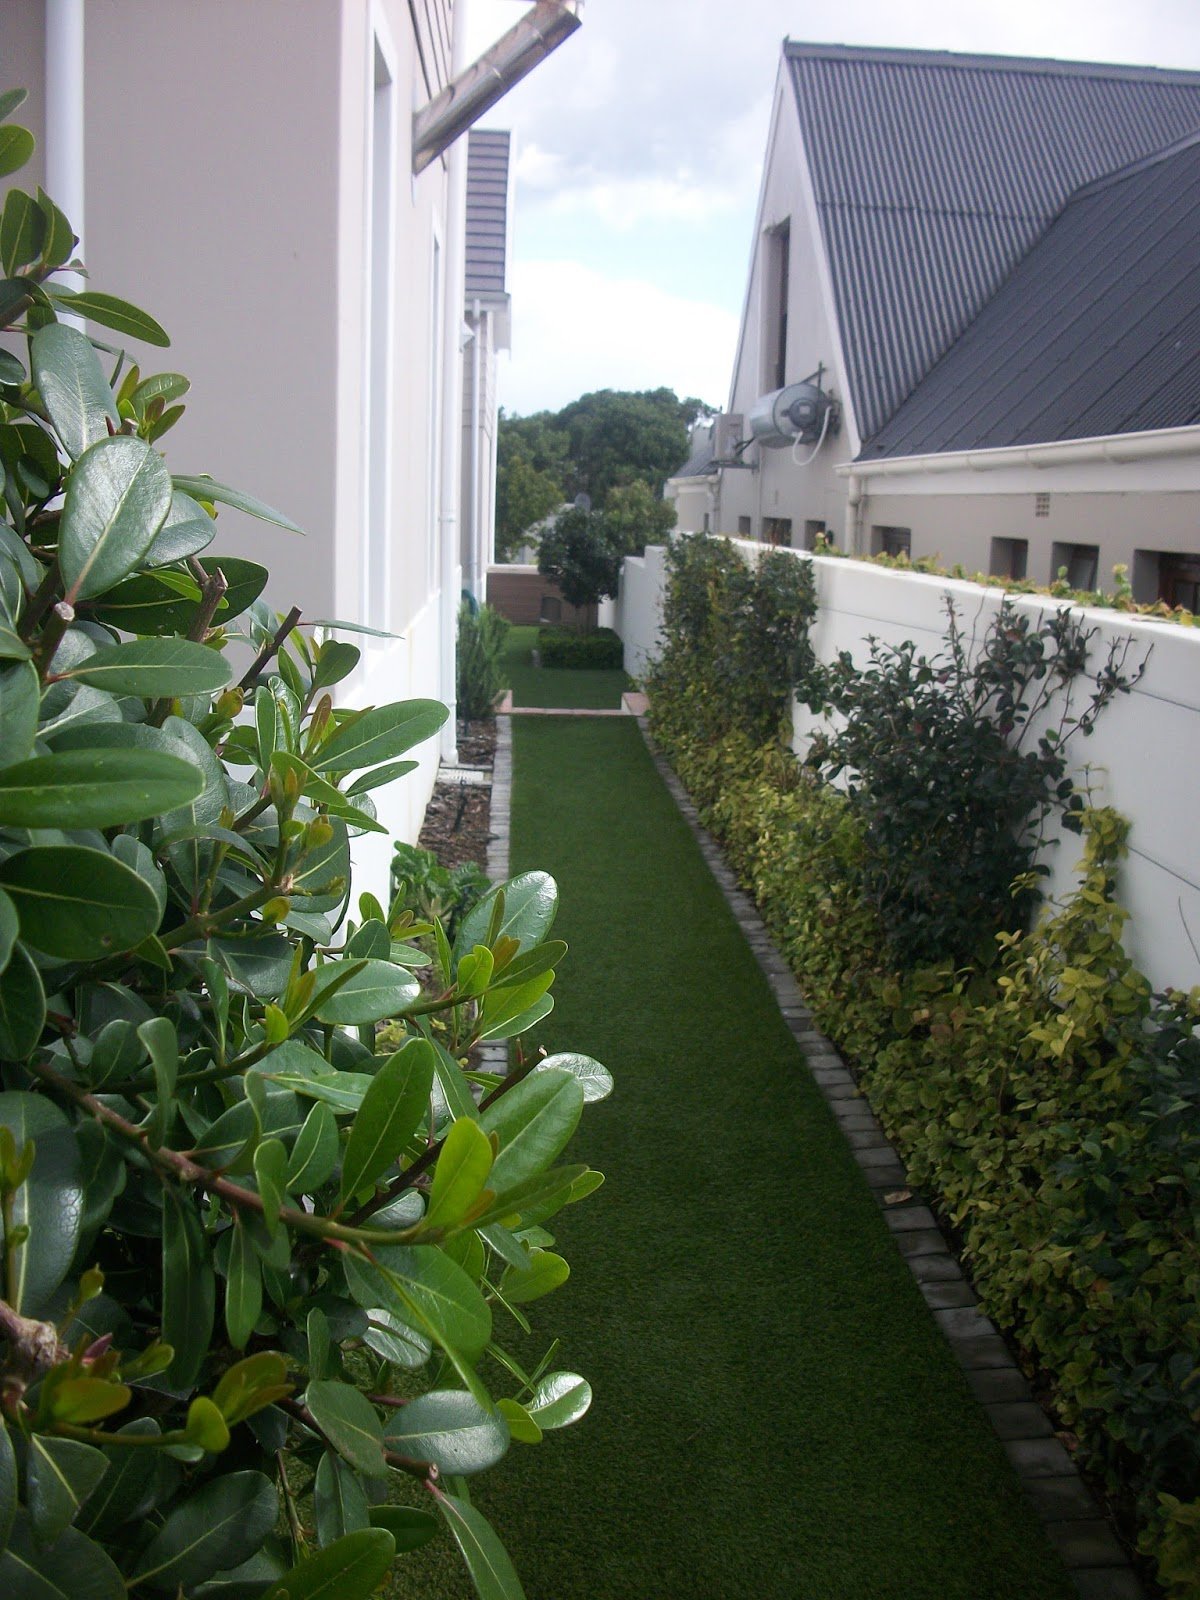 Gardening in hermanus landscaping planting and for Garden design 101